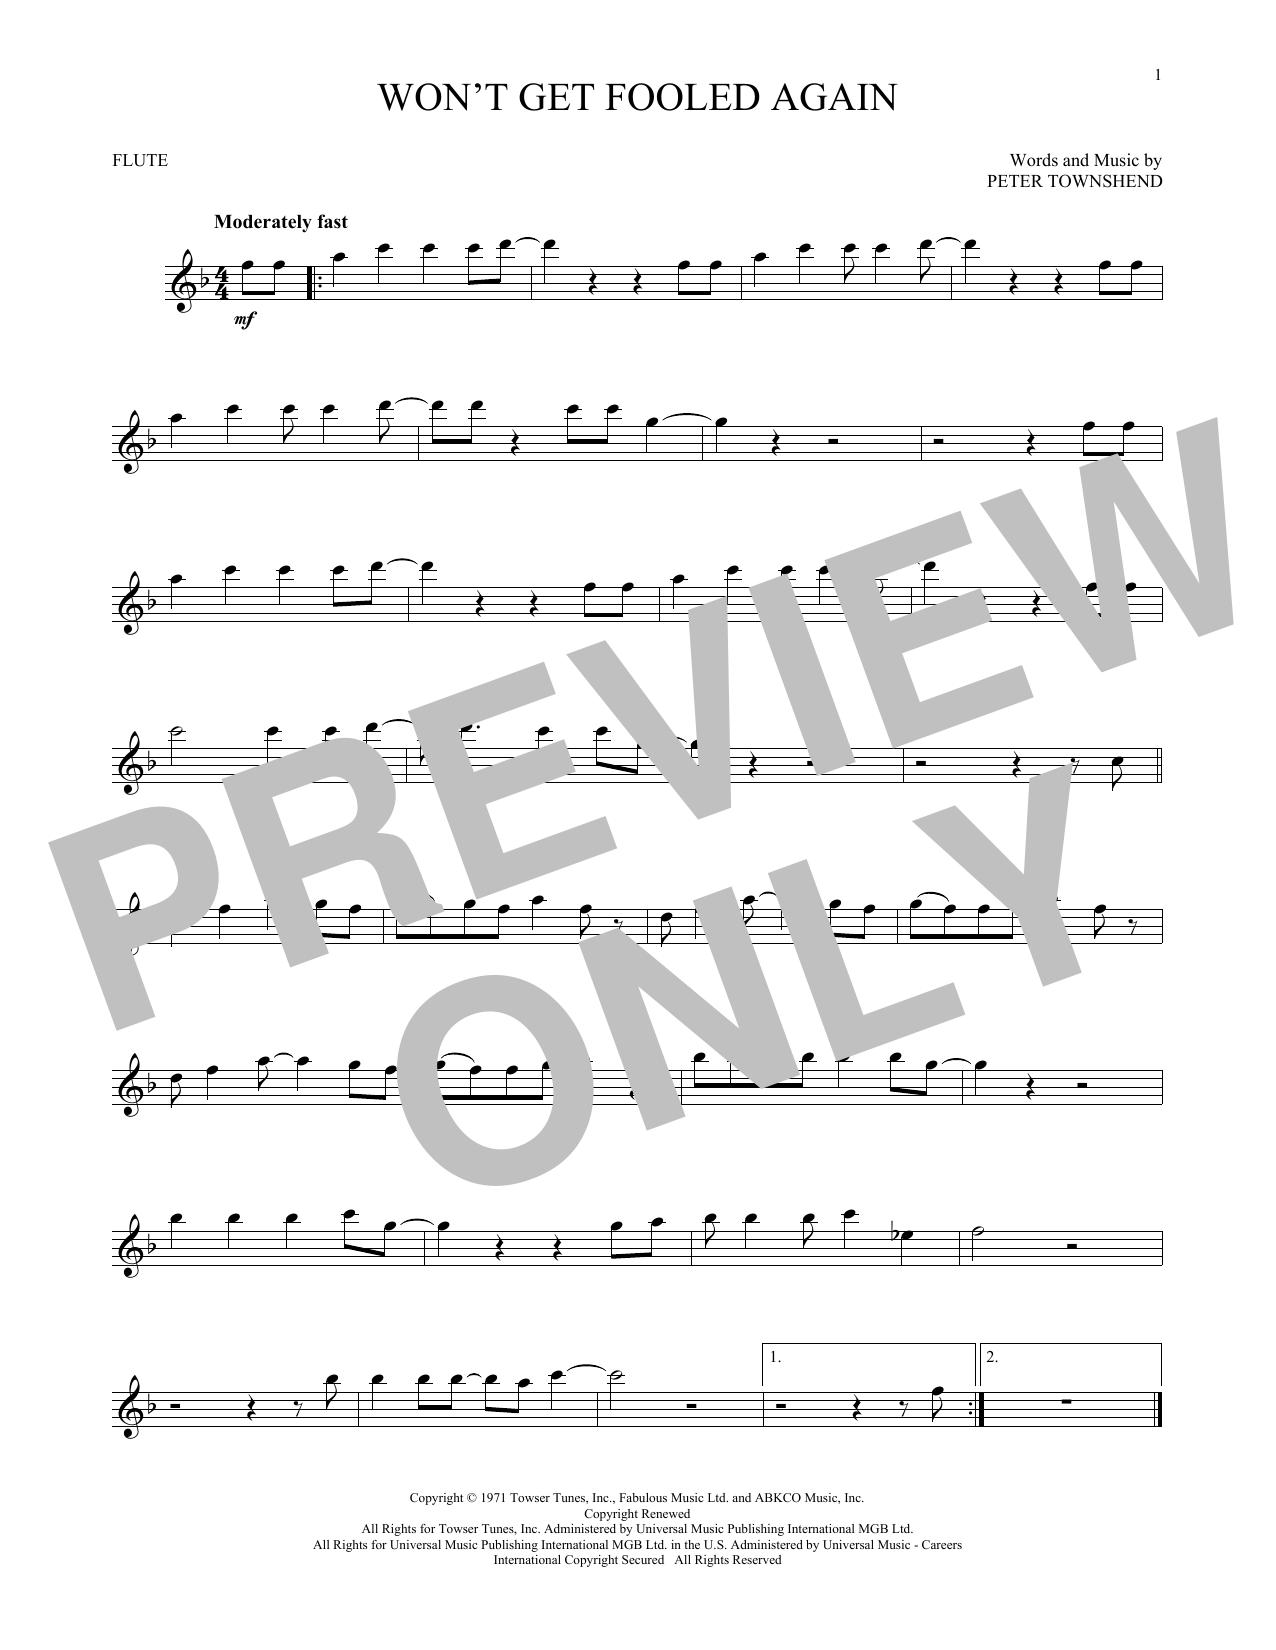 Won't Get Fooled Again (Flute Solo)